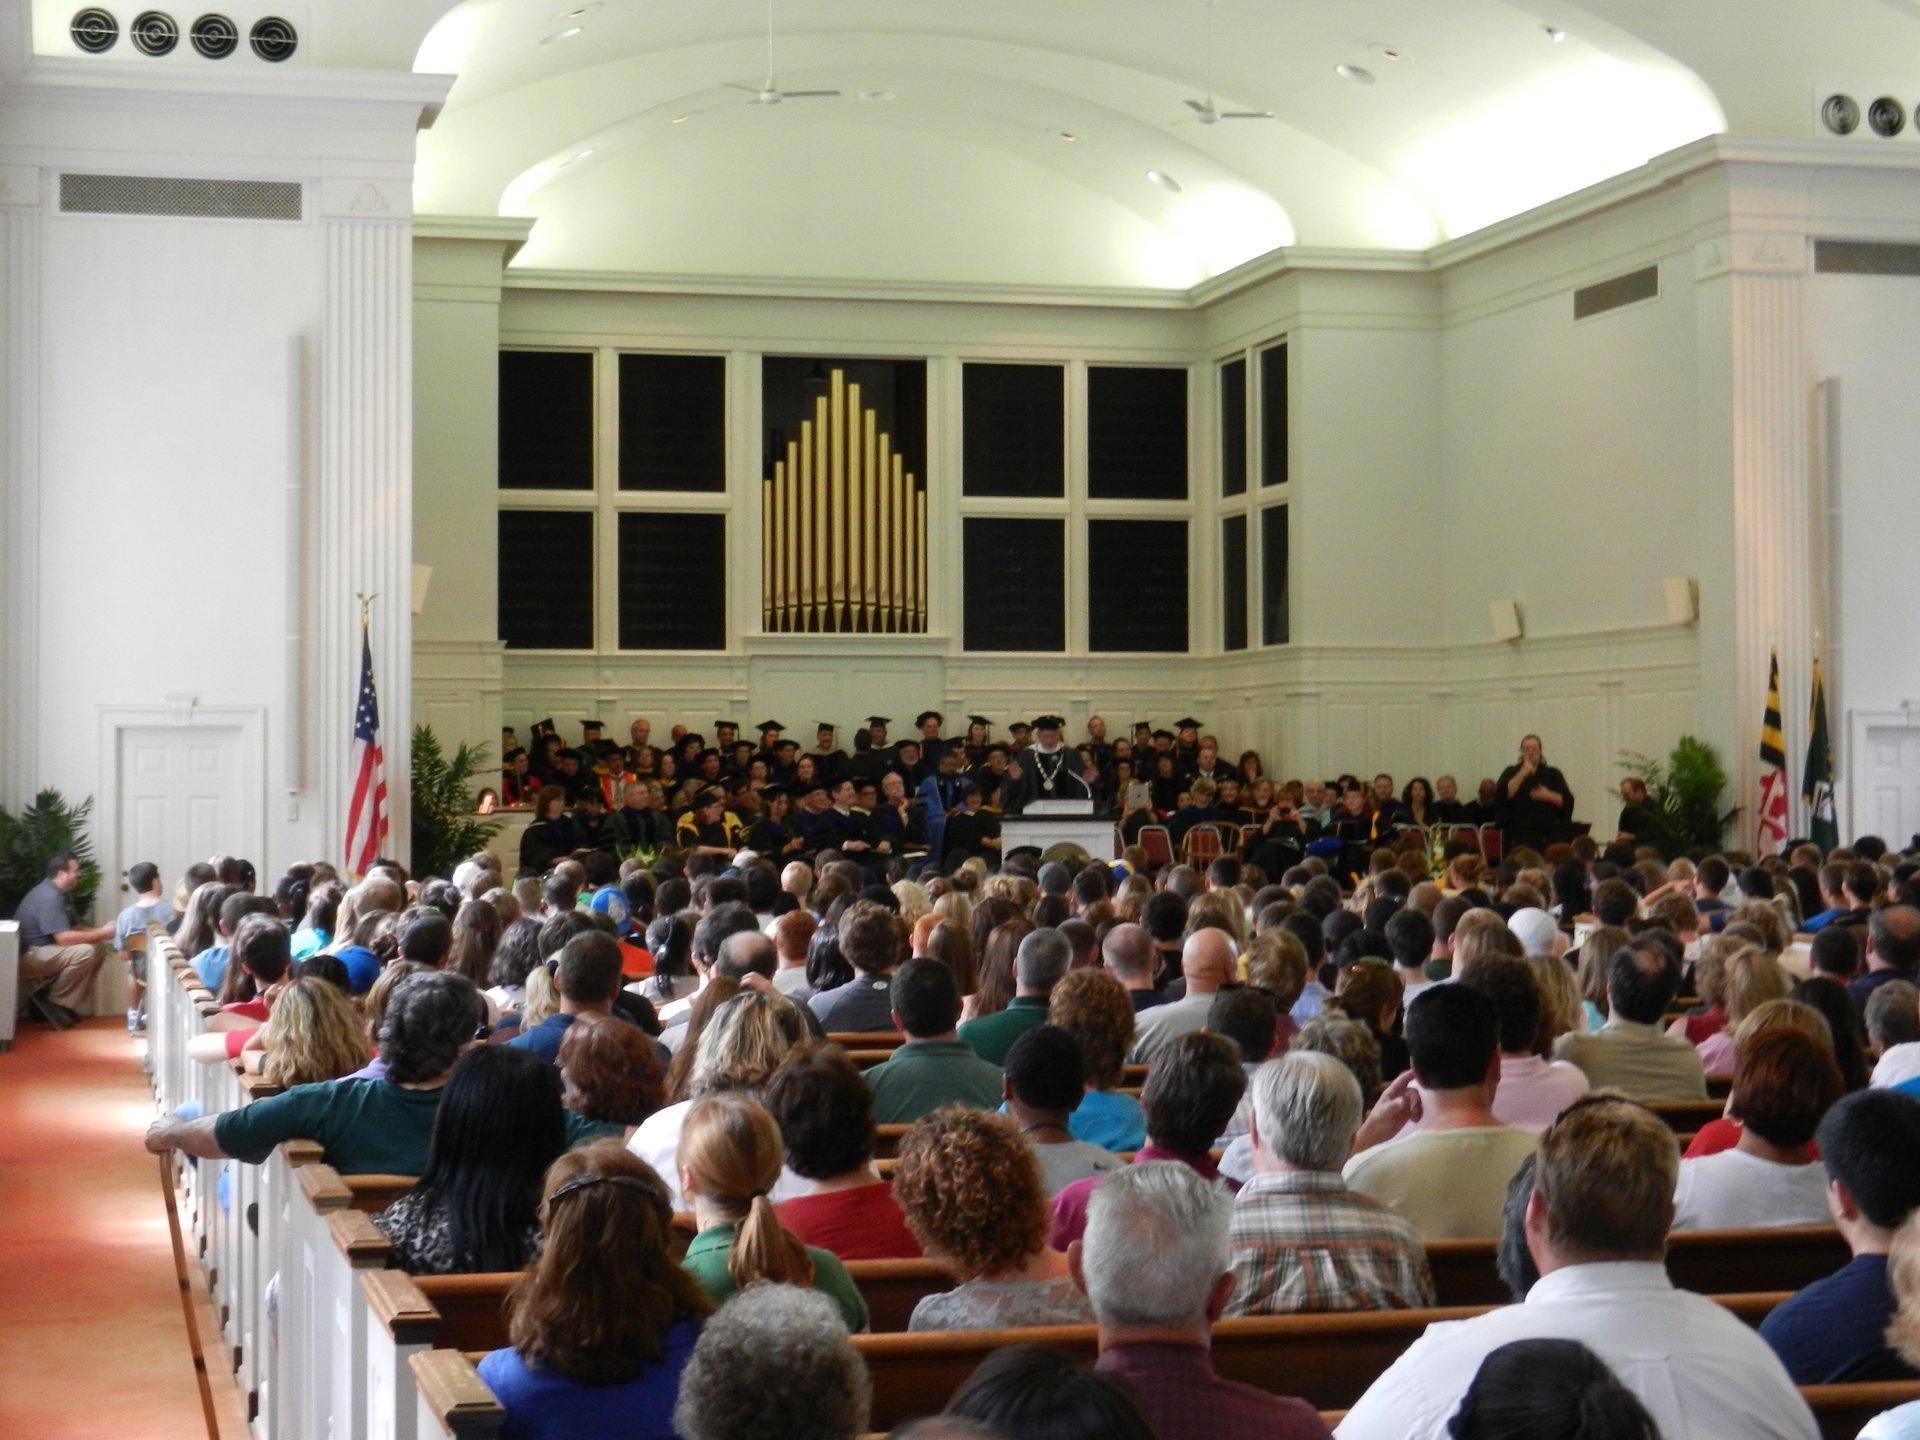 McDaniel College Backer Memorial Chapel Westminster, MD